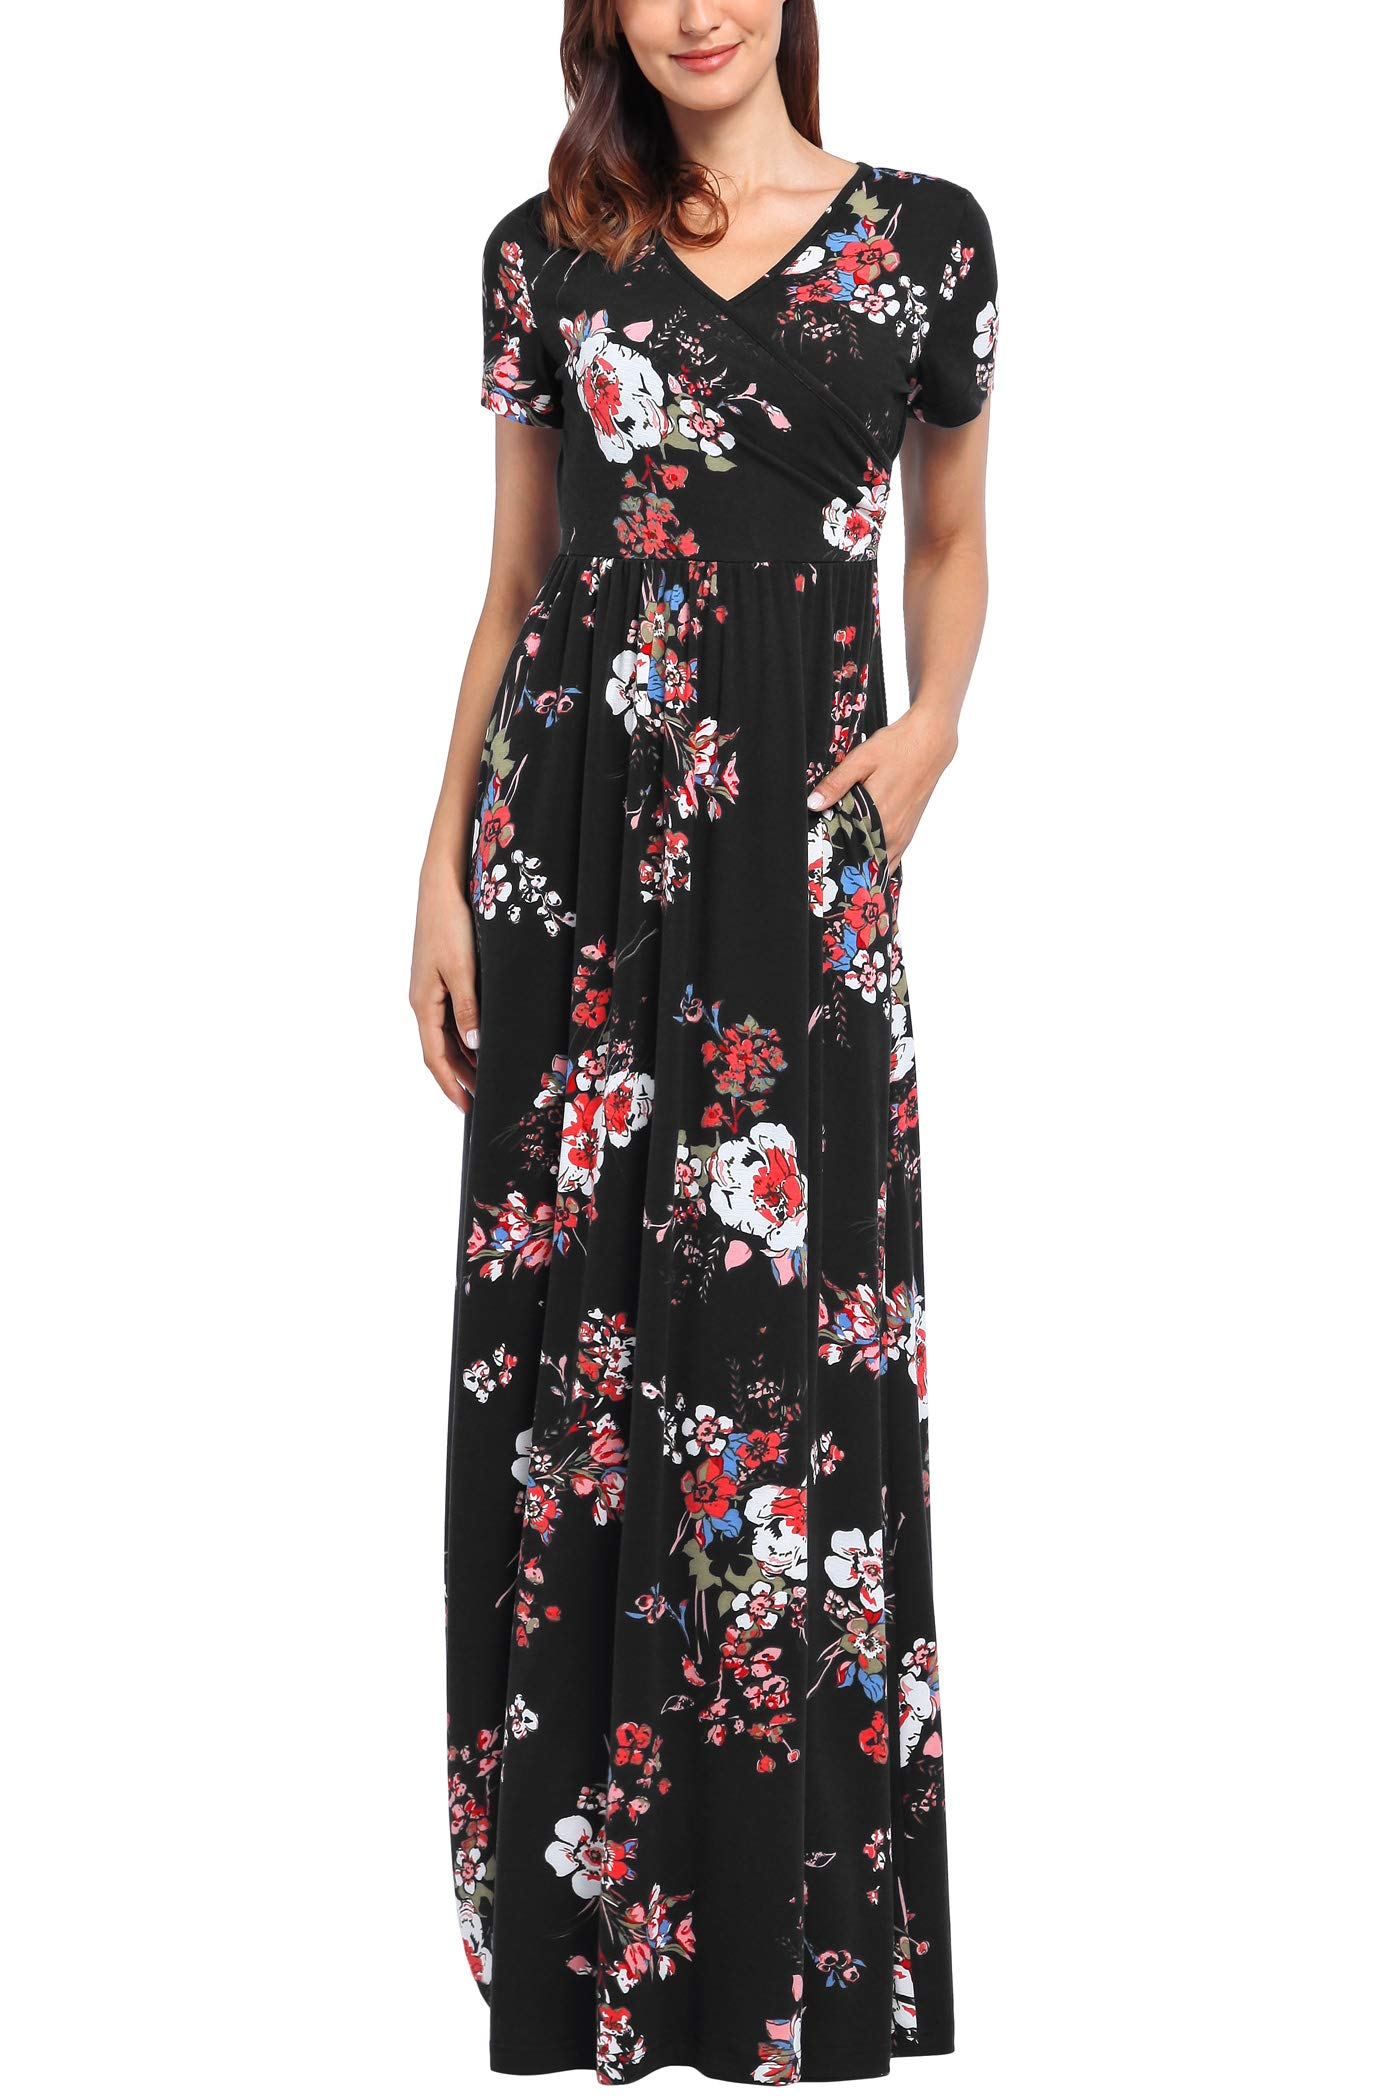 Comila Short Sleeve Maxi Dresses for Women, Summer V Neck Dress Pockets Vintage Floral Maxi Casual Dress with Pockets Elegant Work Office Long Dress Black S (US 4-6) by Comila (Image #2)